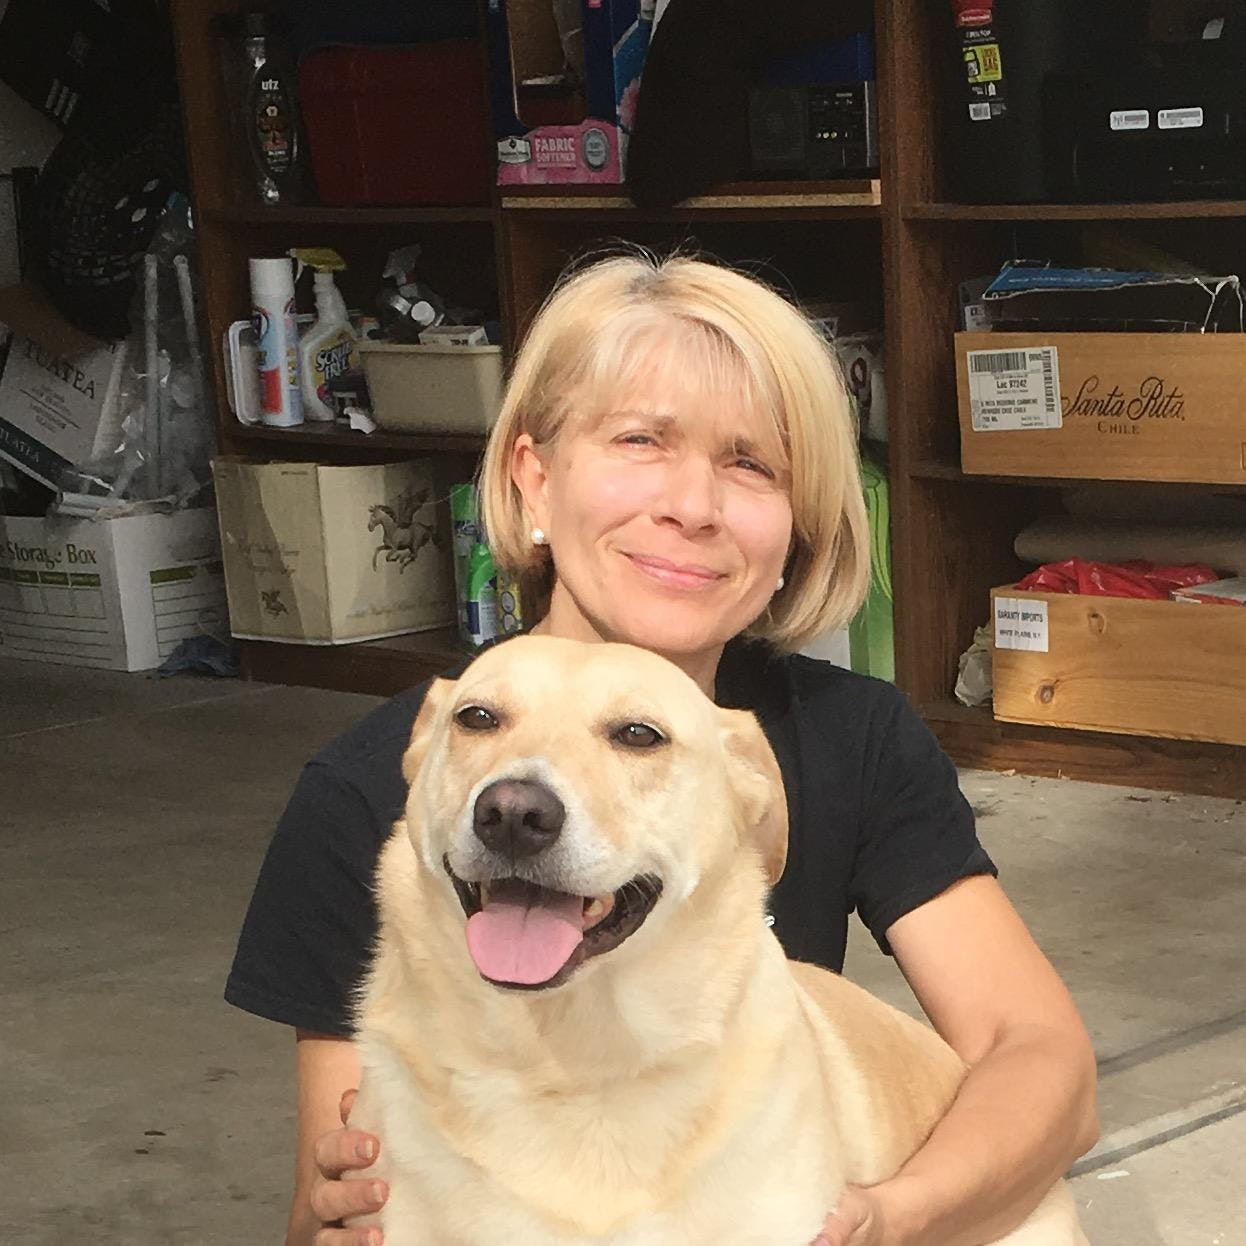 Olha's dog day care